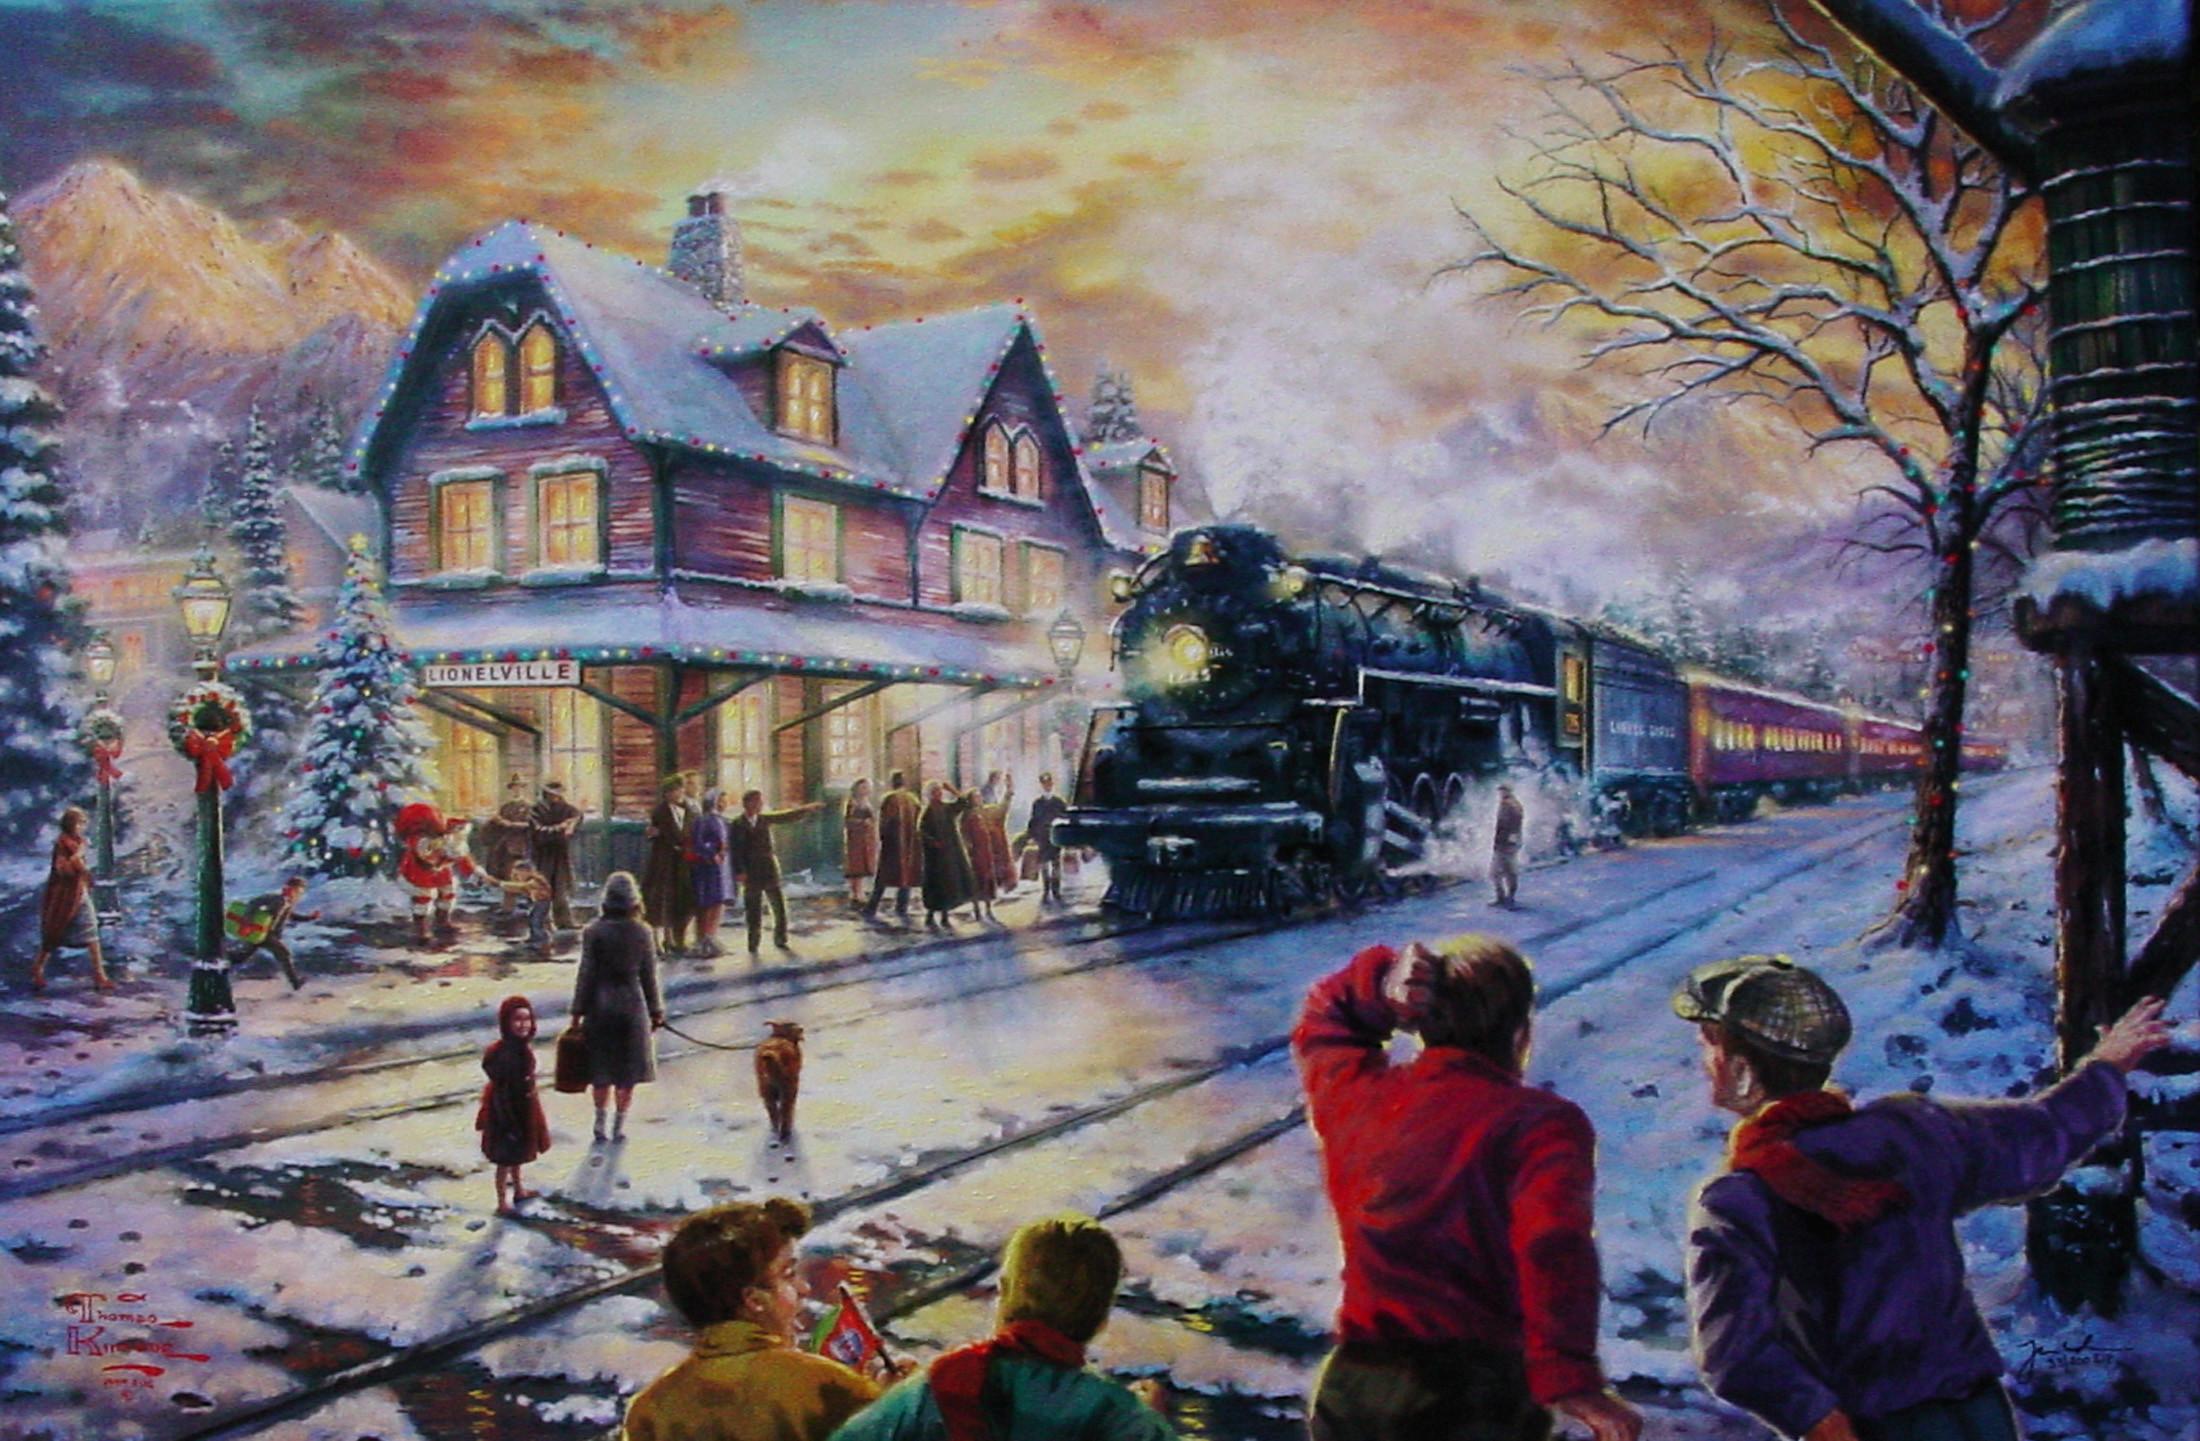 Disney Princess 3d Wallpaper Thomas Kinkade Christmas Backgrounds 183 ①